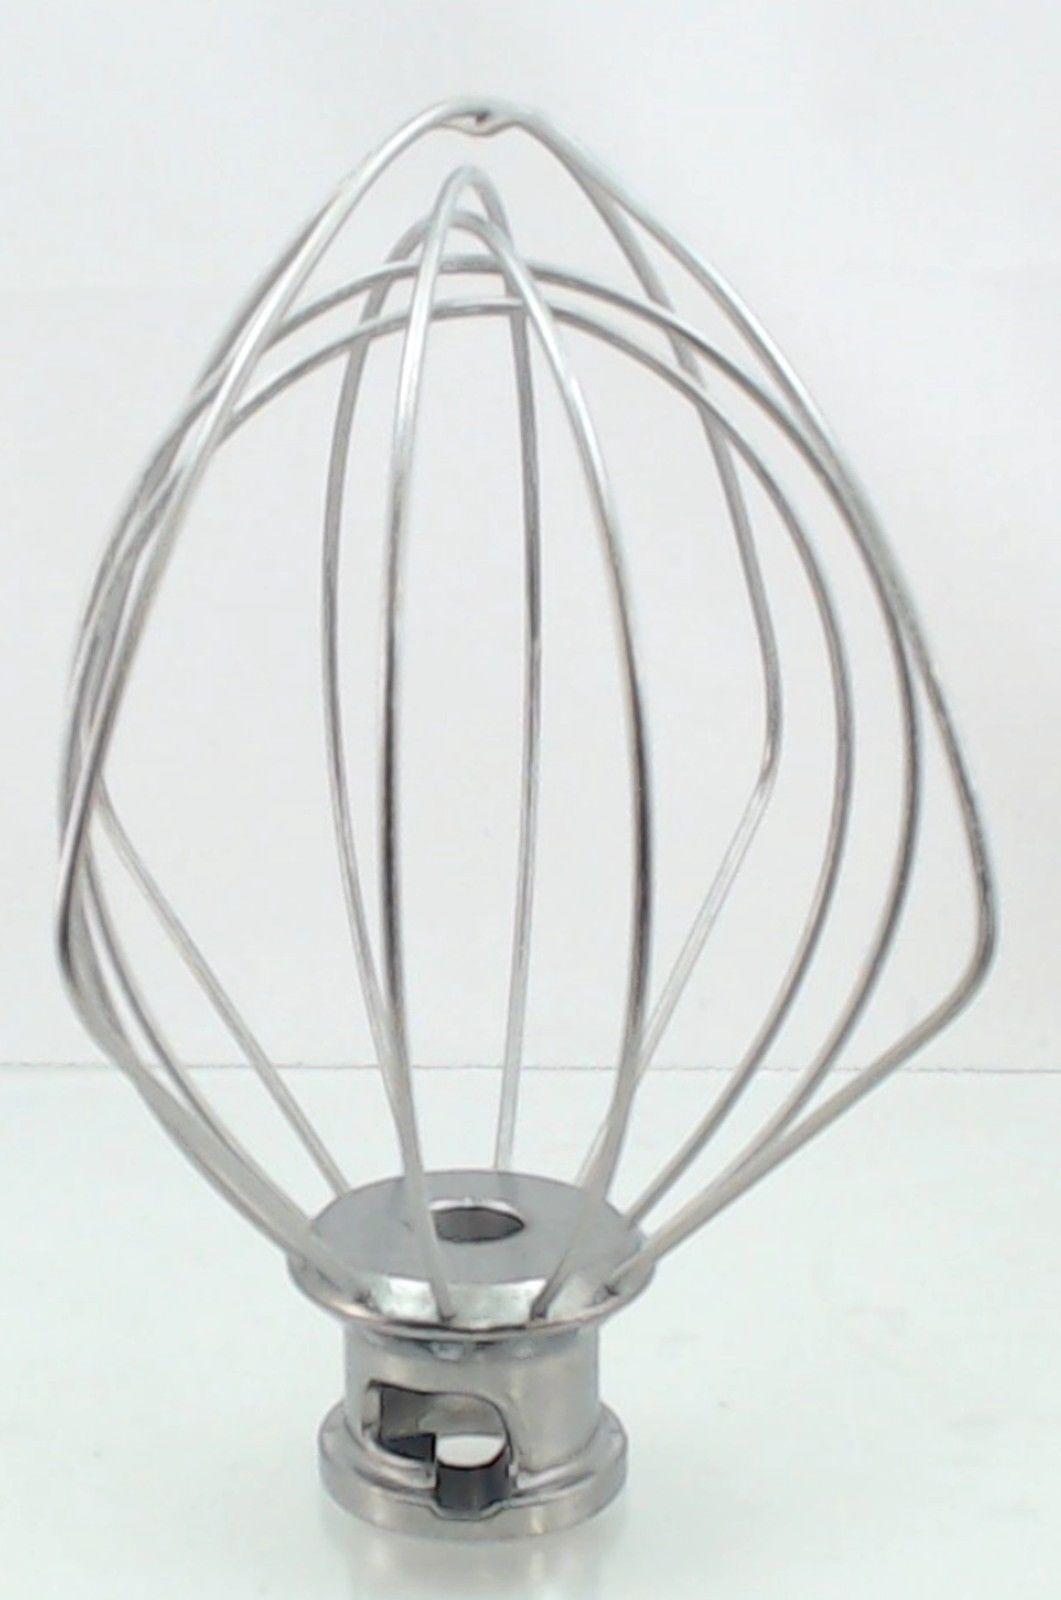 Stand Mixer, 4.5 QT Wire Whip, for KitchenAid, K45WW, SA9704